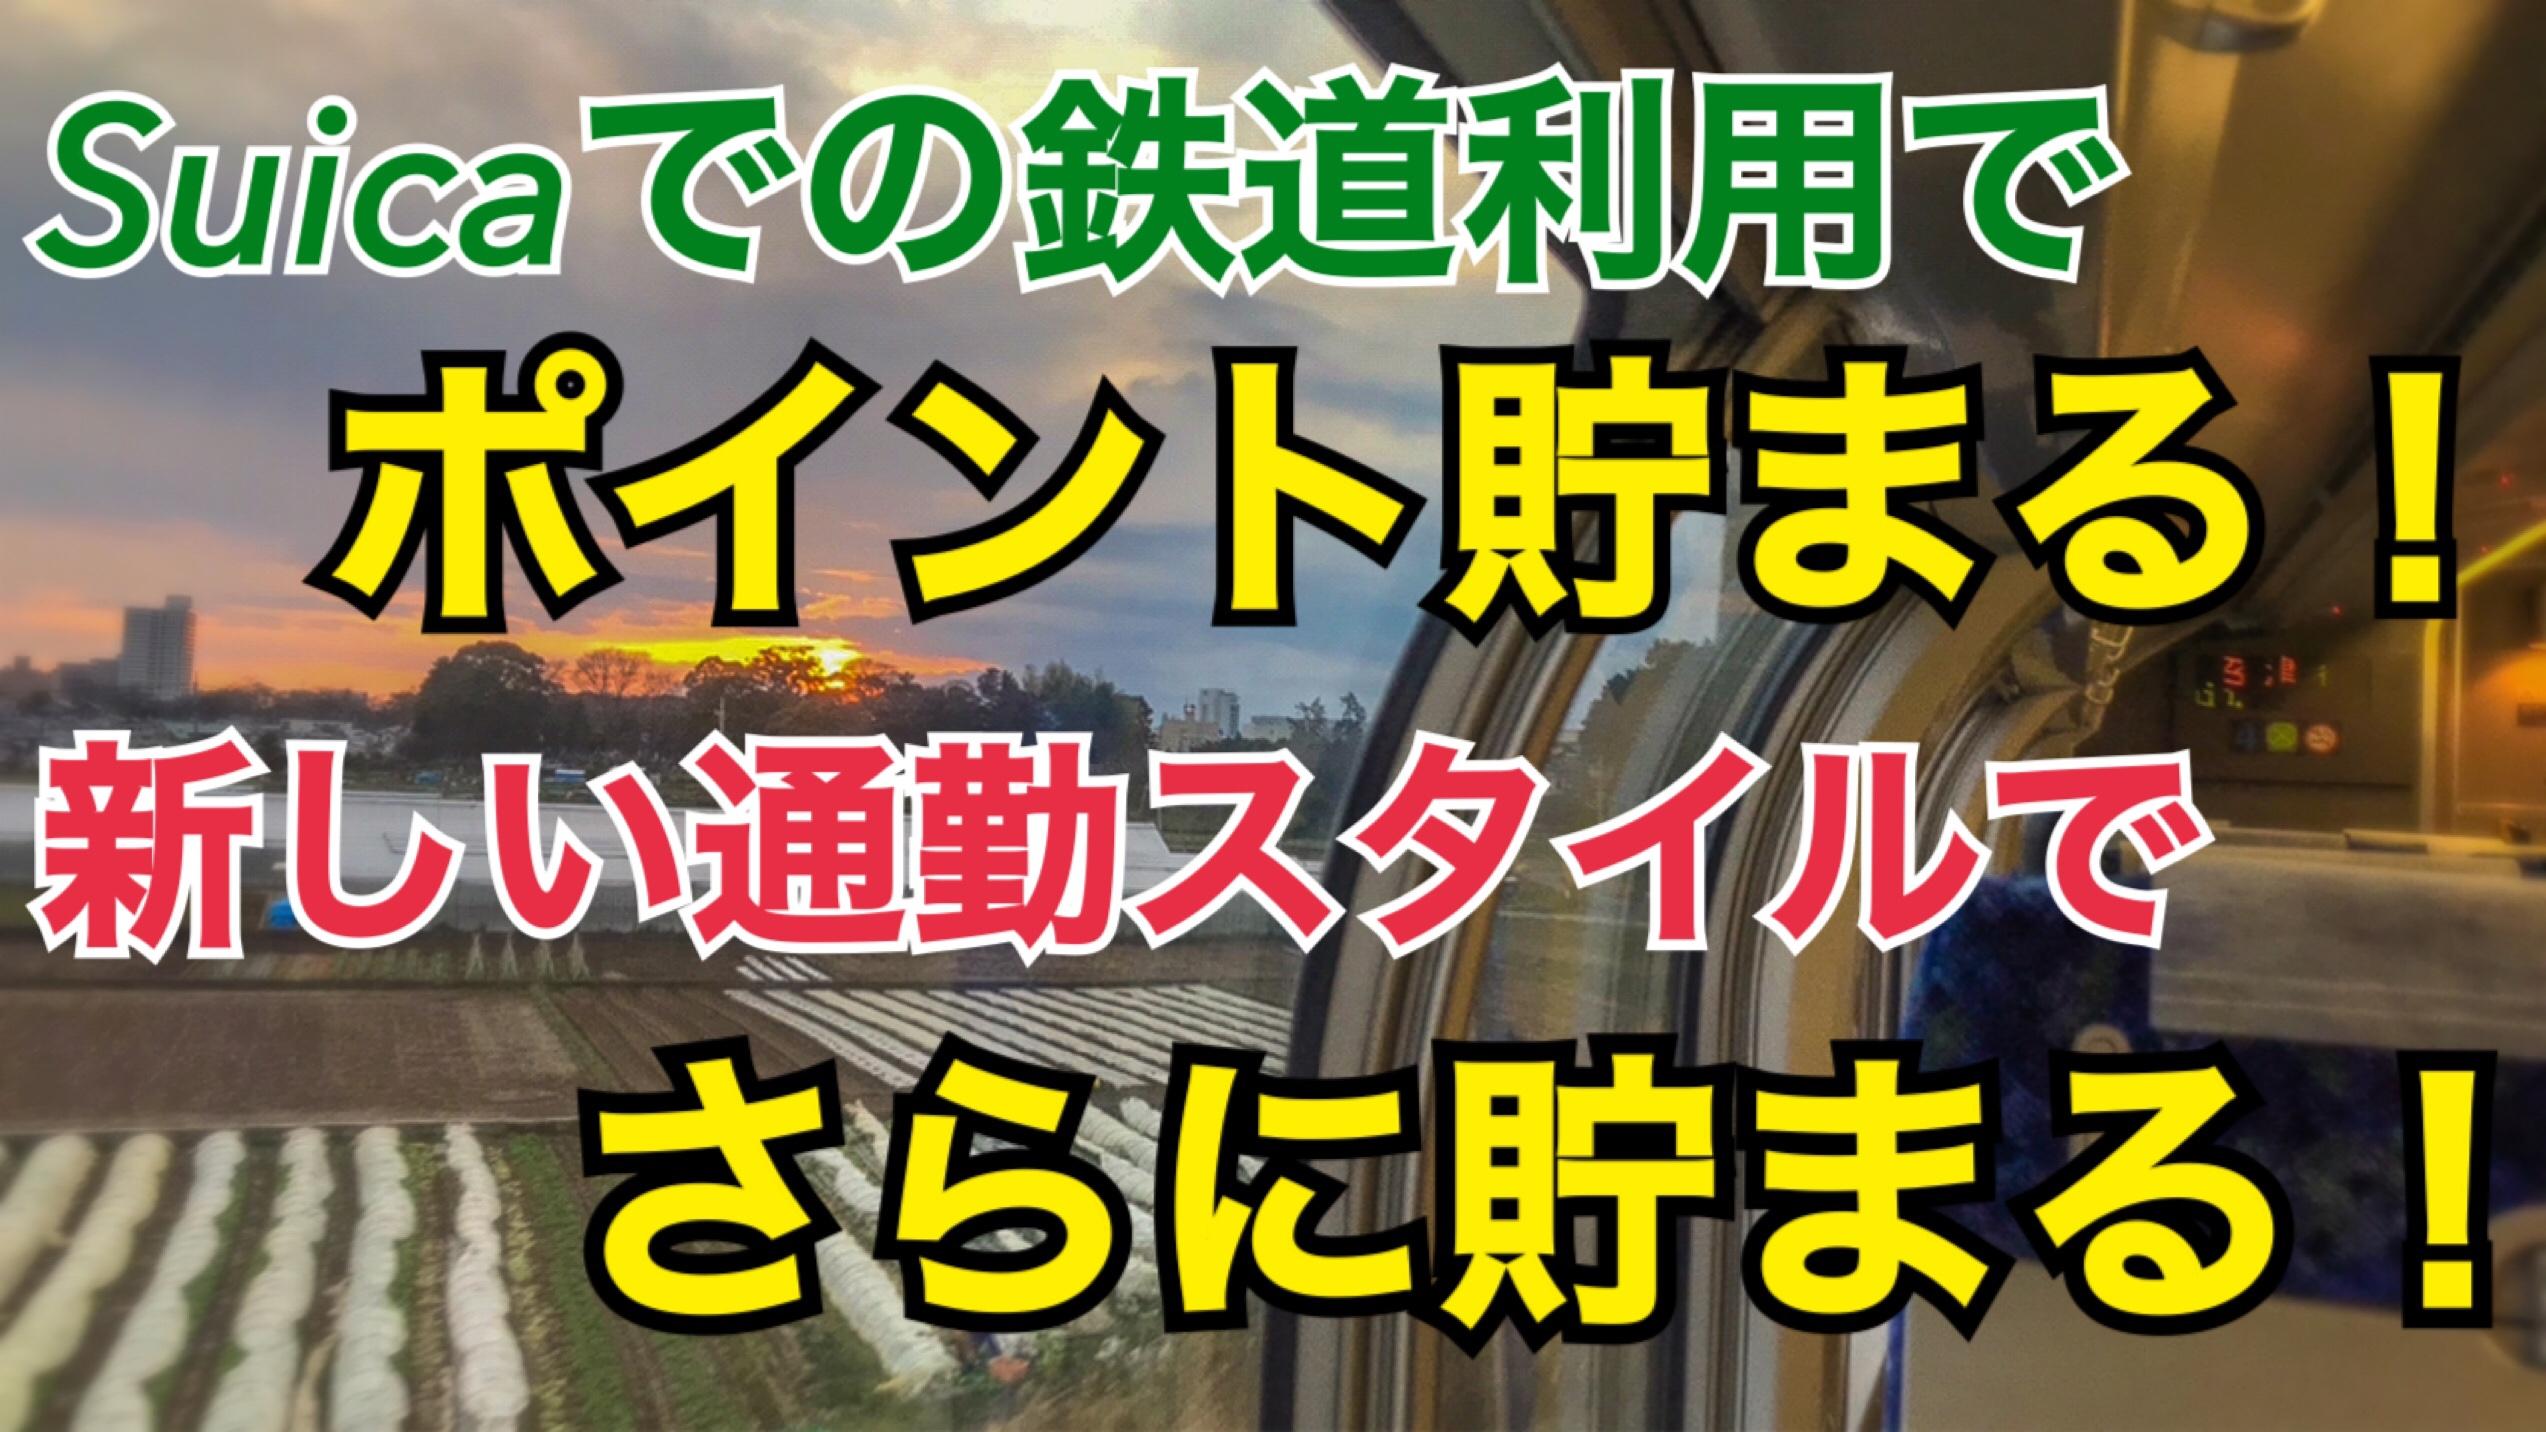 JR東日本にSuicaで乗るとポイント貯まる!オフピークポイントサービス、リピートポイントサービスの利用方法を解説!JRE POINTの登録方法は?